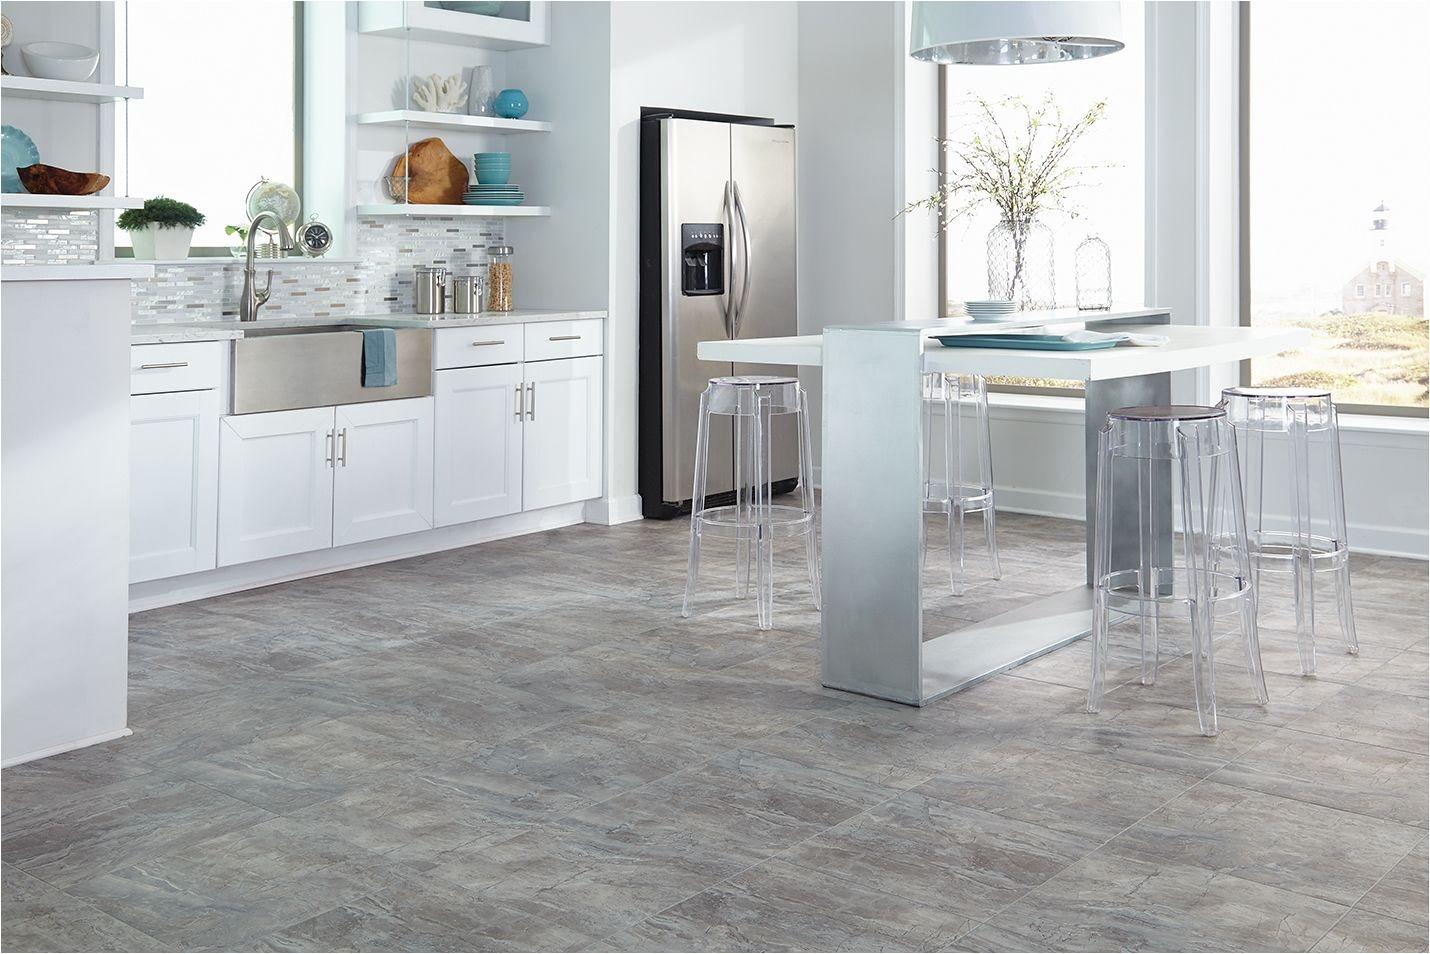 Rubber Flooring Tiles Outdoor 34 Elegant Rubber Flooring Kitchen Trinitycountyfoodbank Com